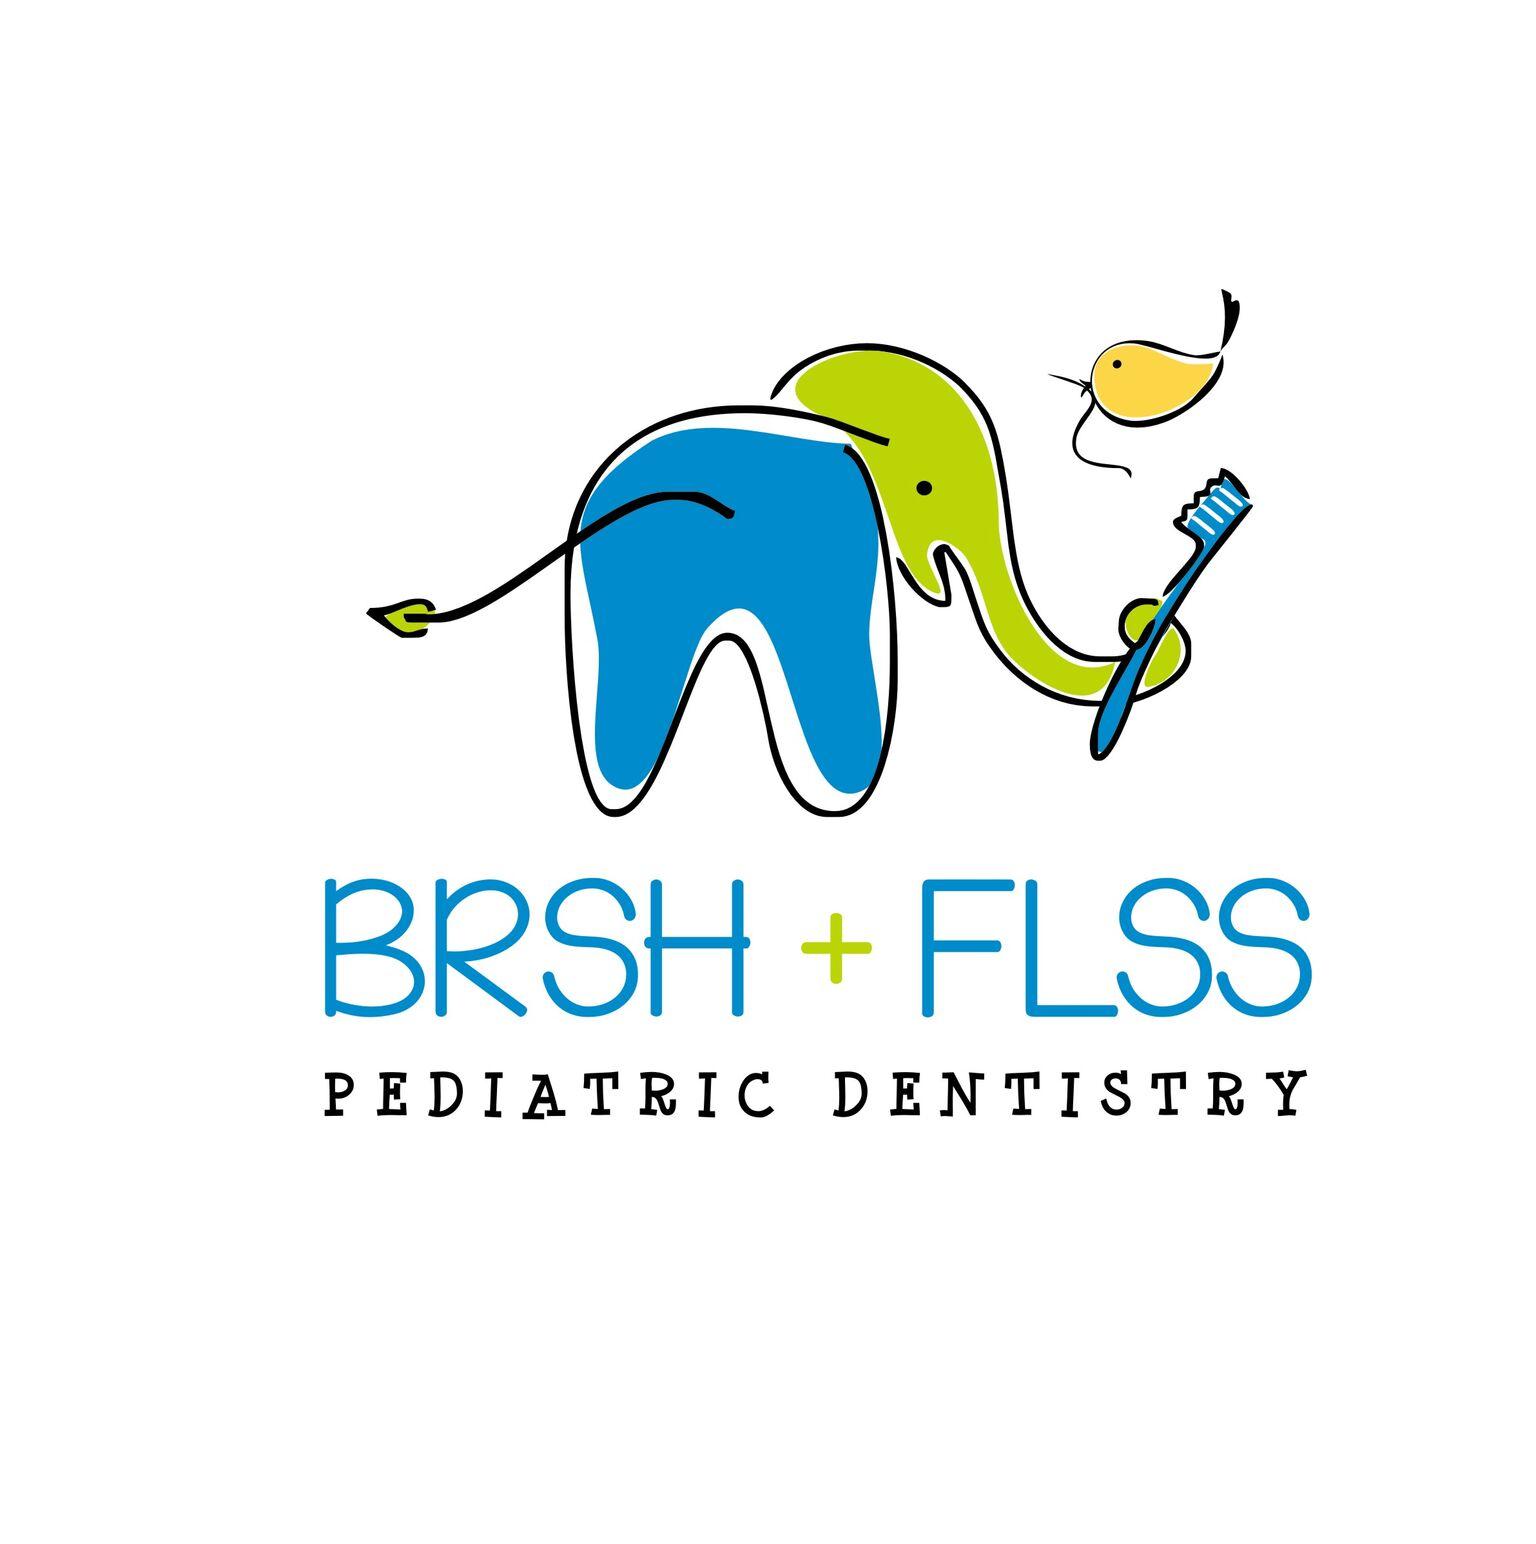 Brsh + Flss San Diego